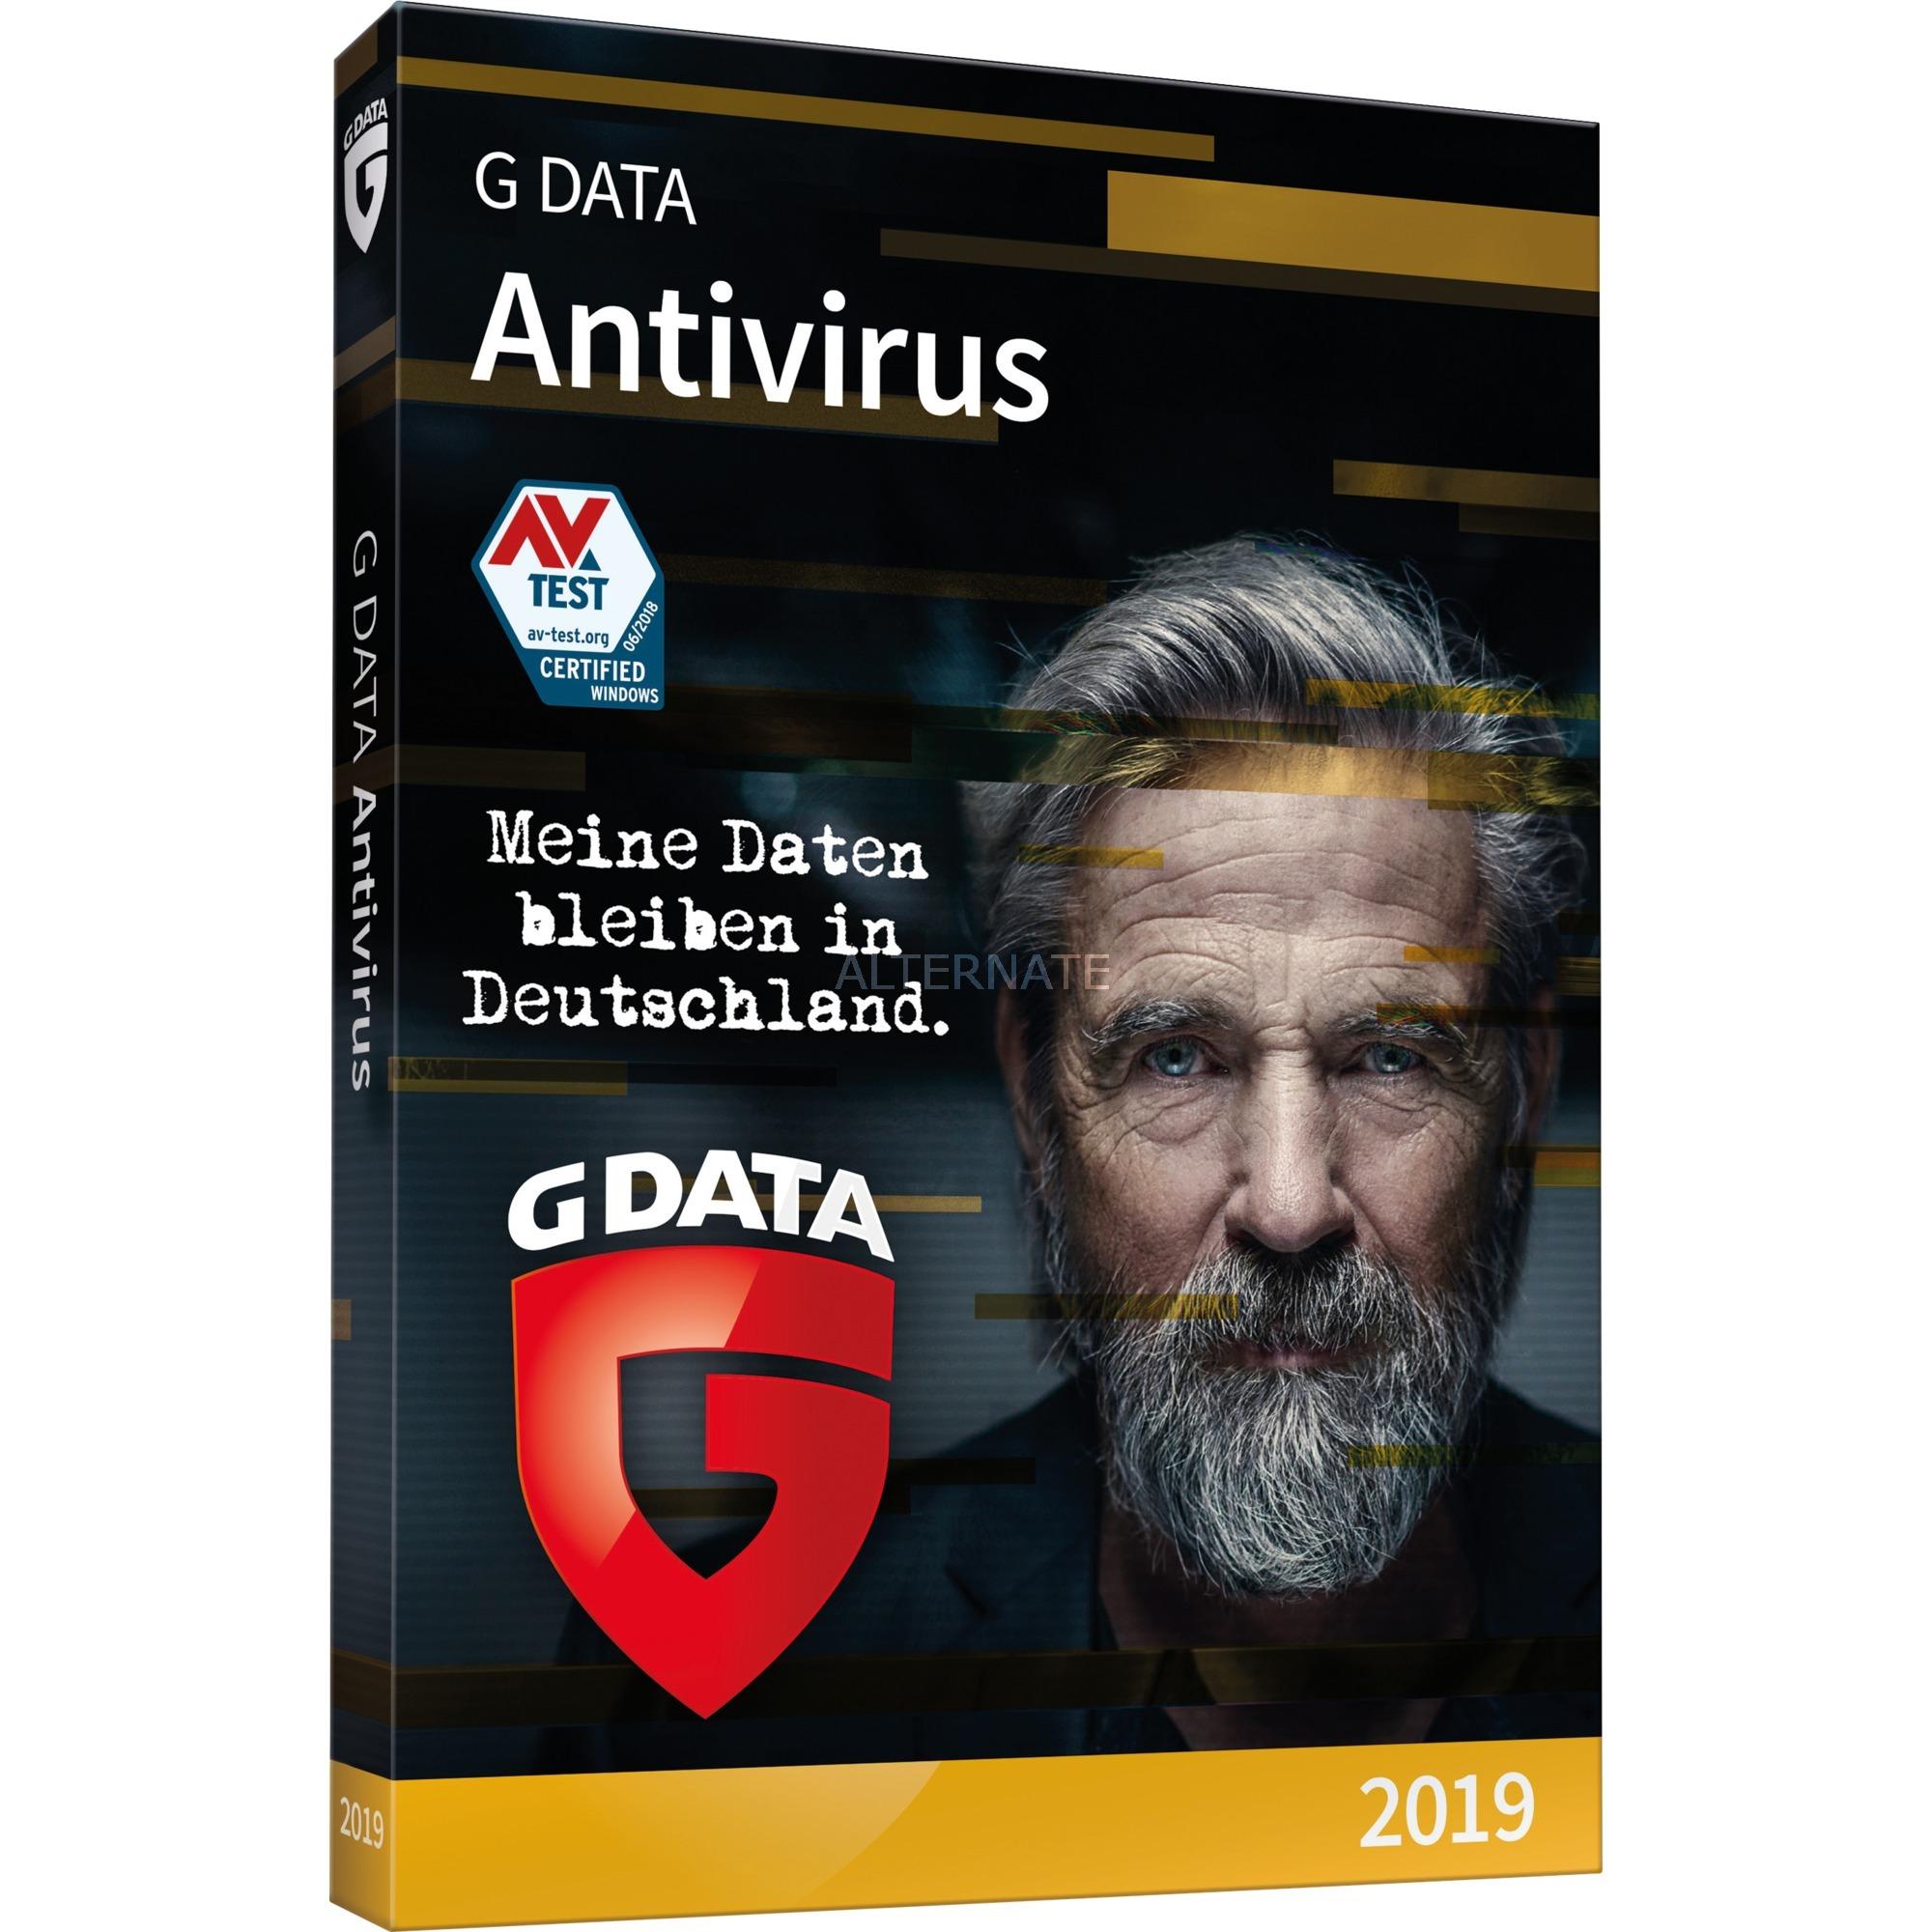 GDATA ANTIVIRUS 2019 - 1 PC 1 Jahr BOX 1 año(s), Software